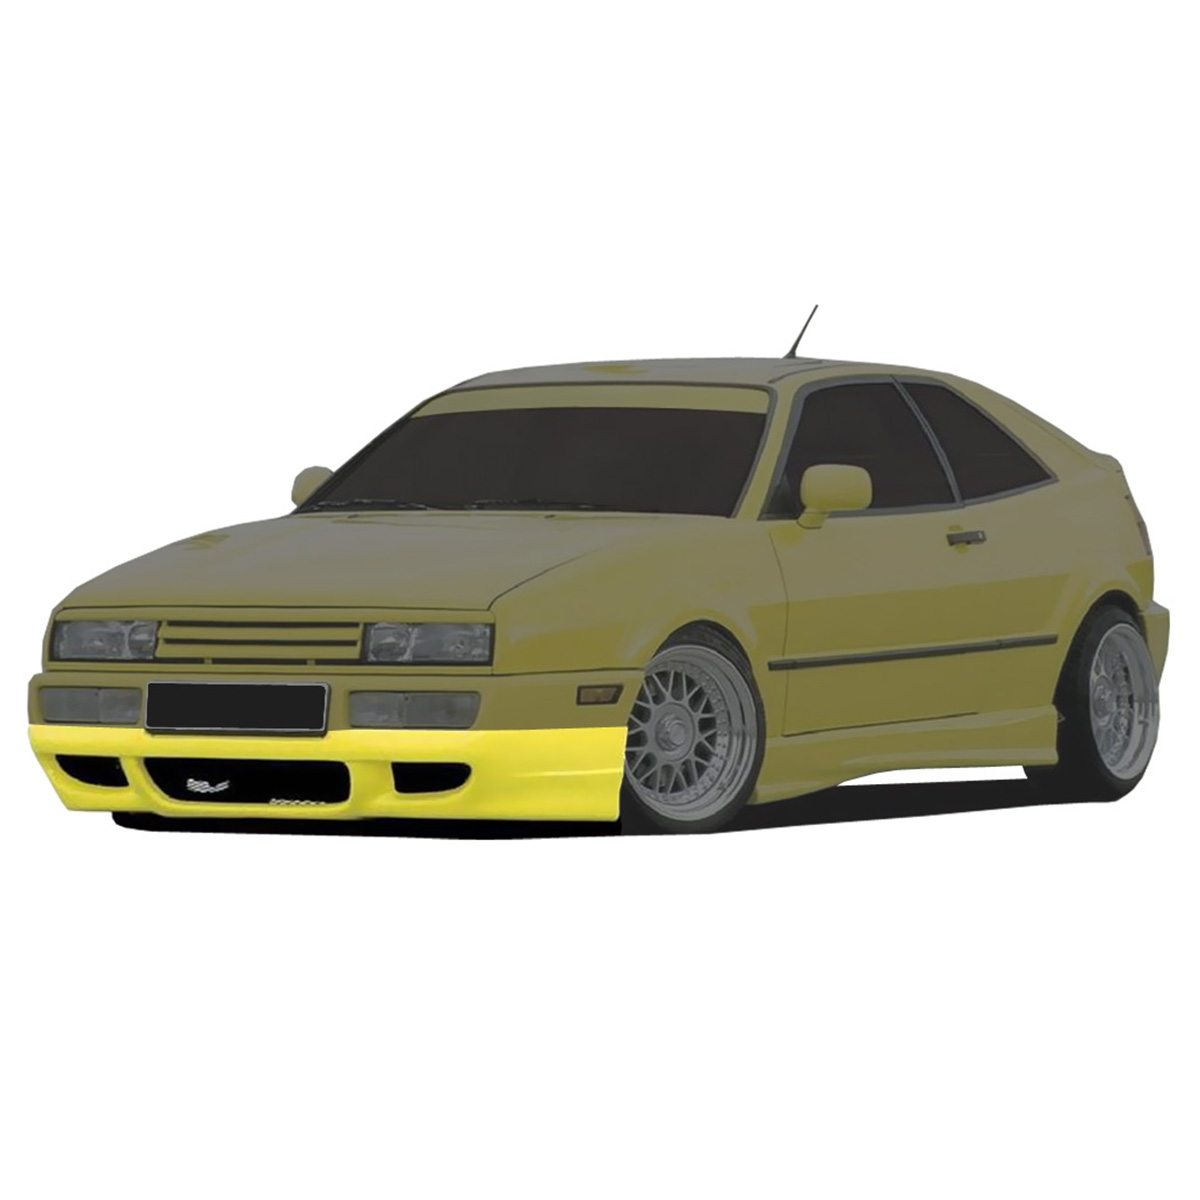 VW-Corrado-Spoiler-Frt-SPU0624